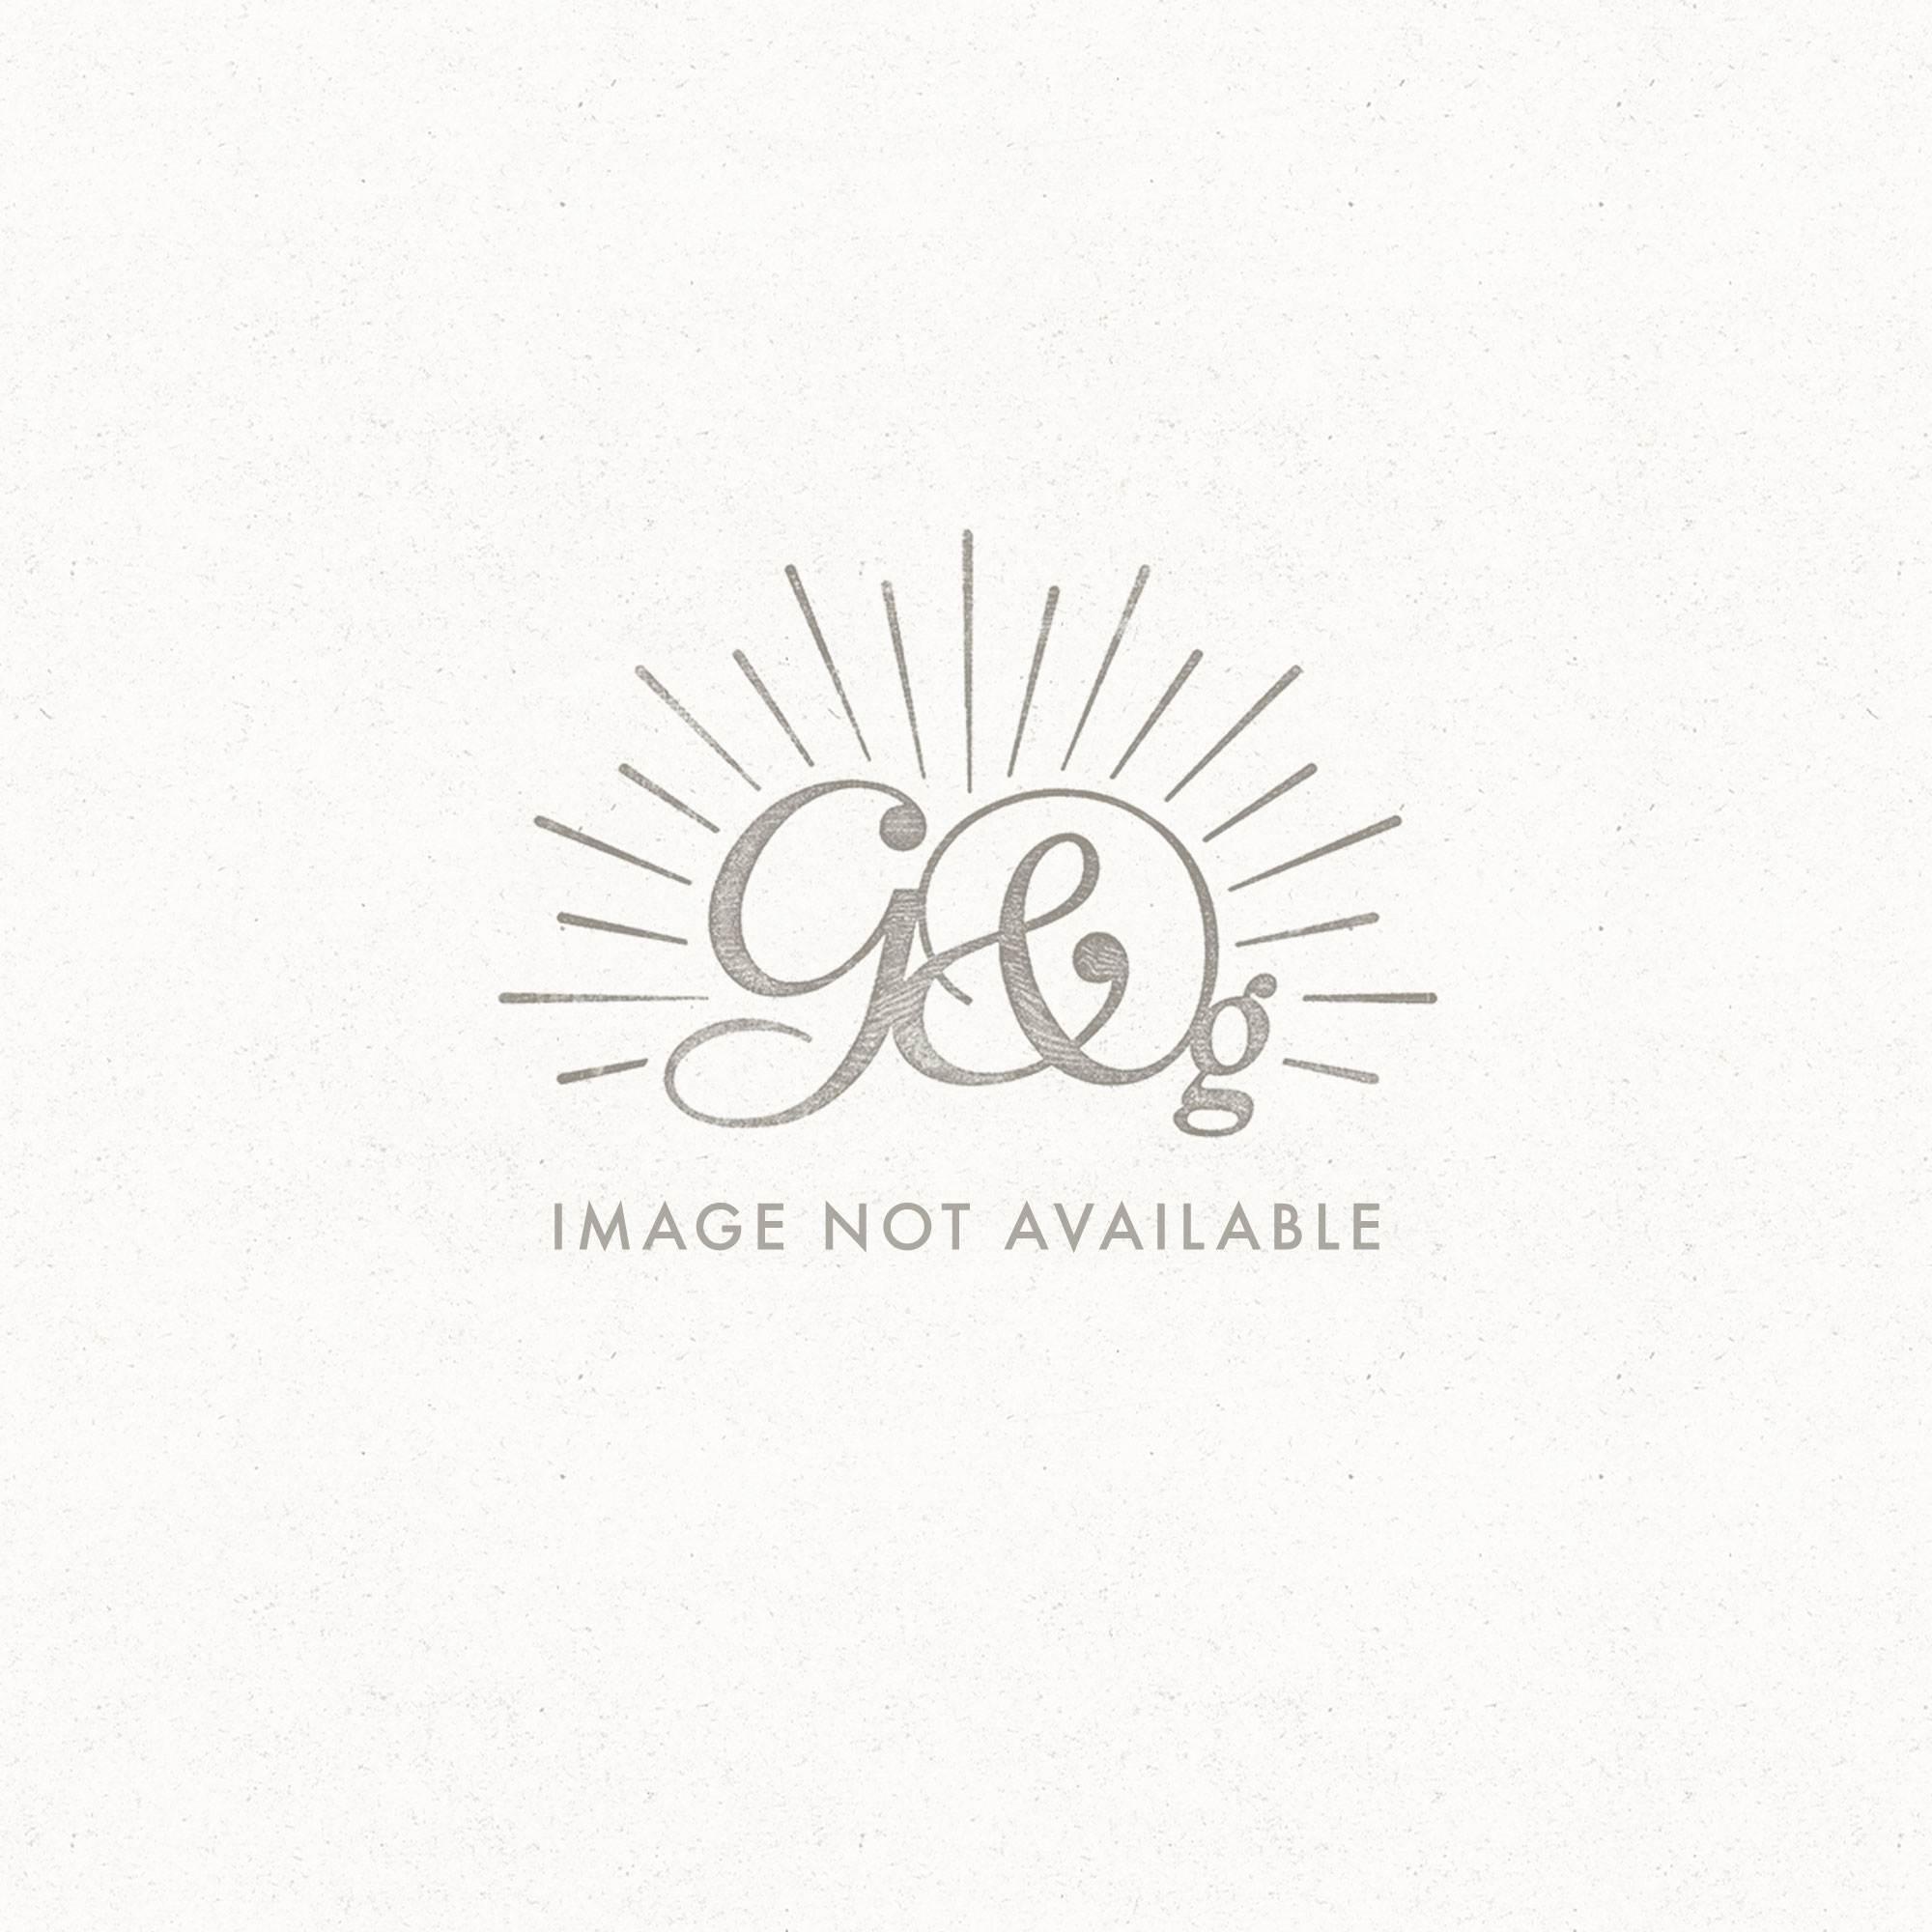 Tinsel Wreath Glasses - Thumbnail